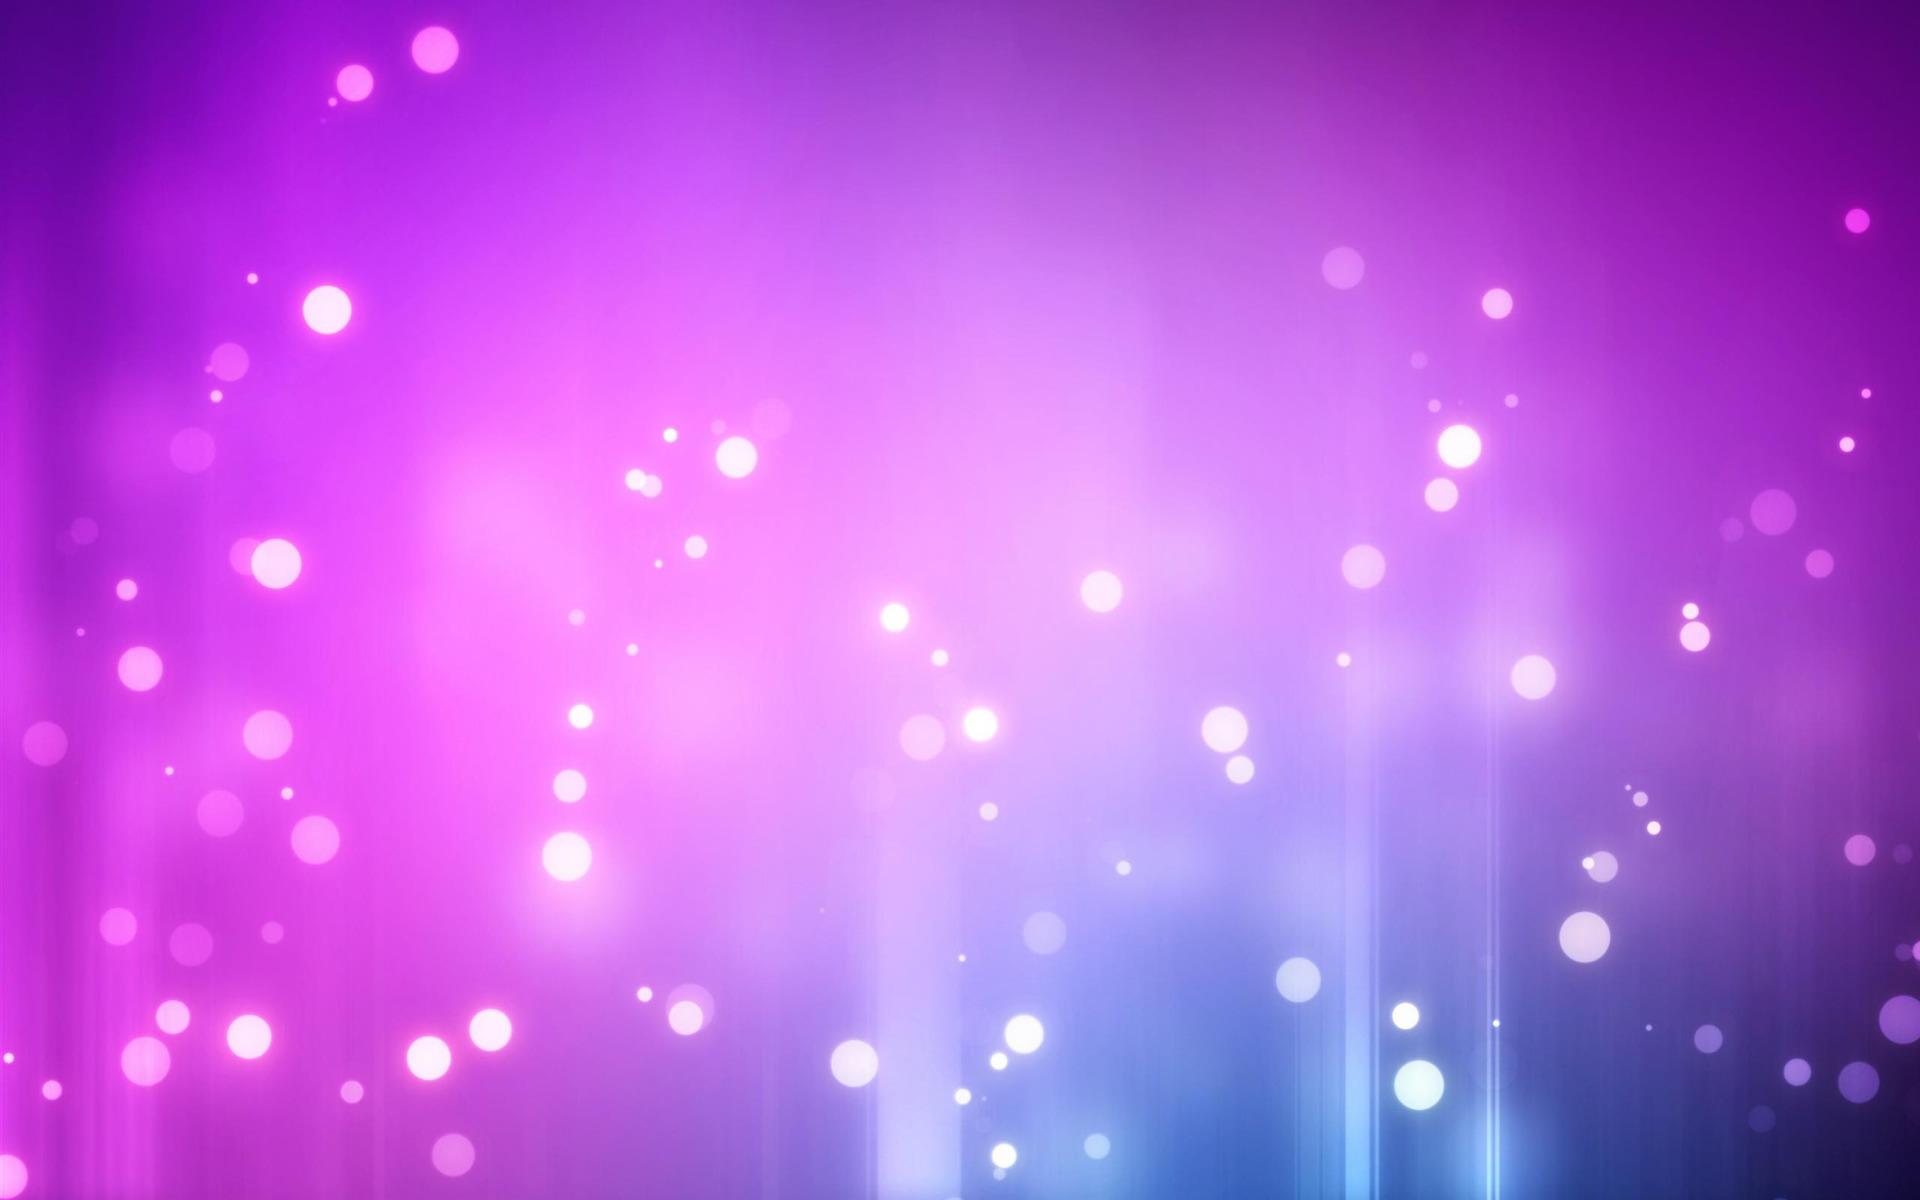 Light Circles Purple-Abstract design wallpaper - 1920x1200 wallpaper    Light Purple Wallpaper Design